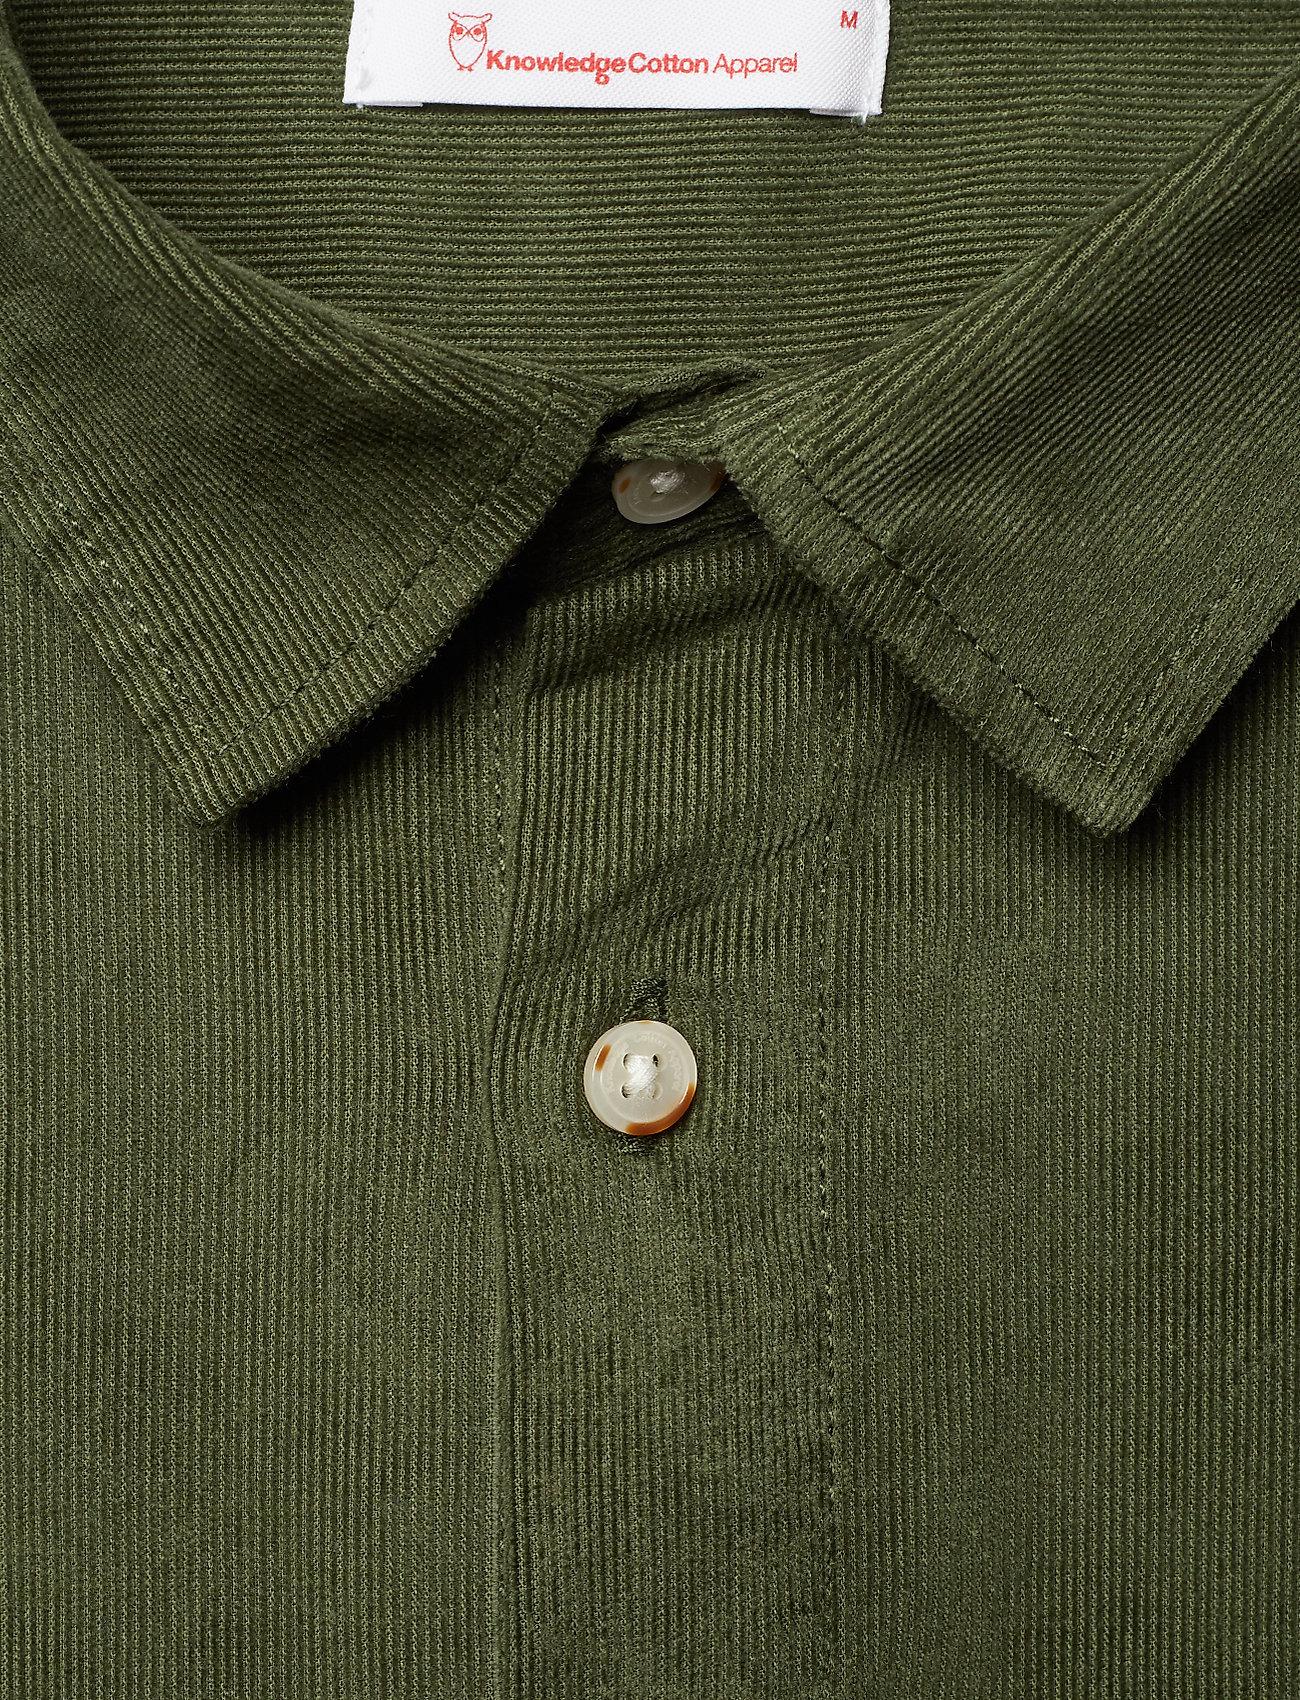 Baby Cord Cotton Apparel Shirtgreen ForestKnowledge uPXTwkilOZ